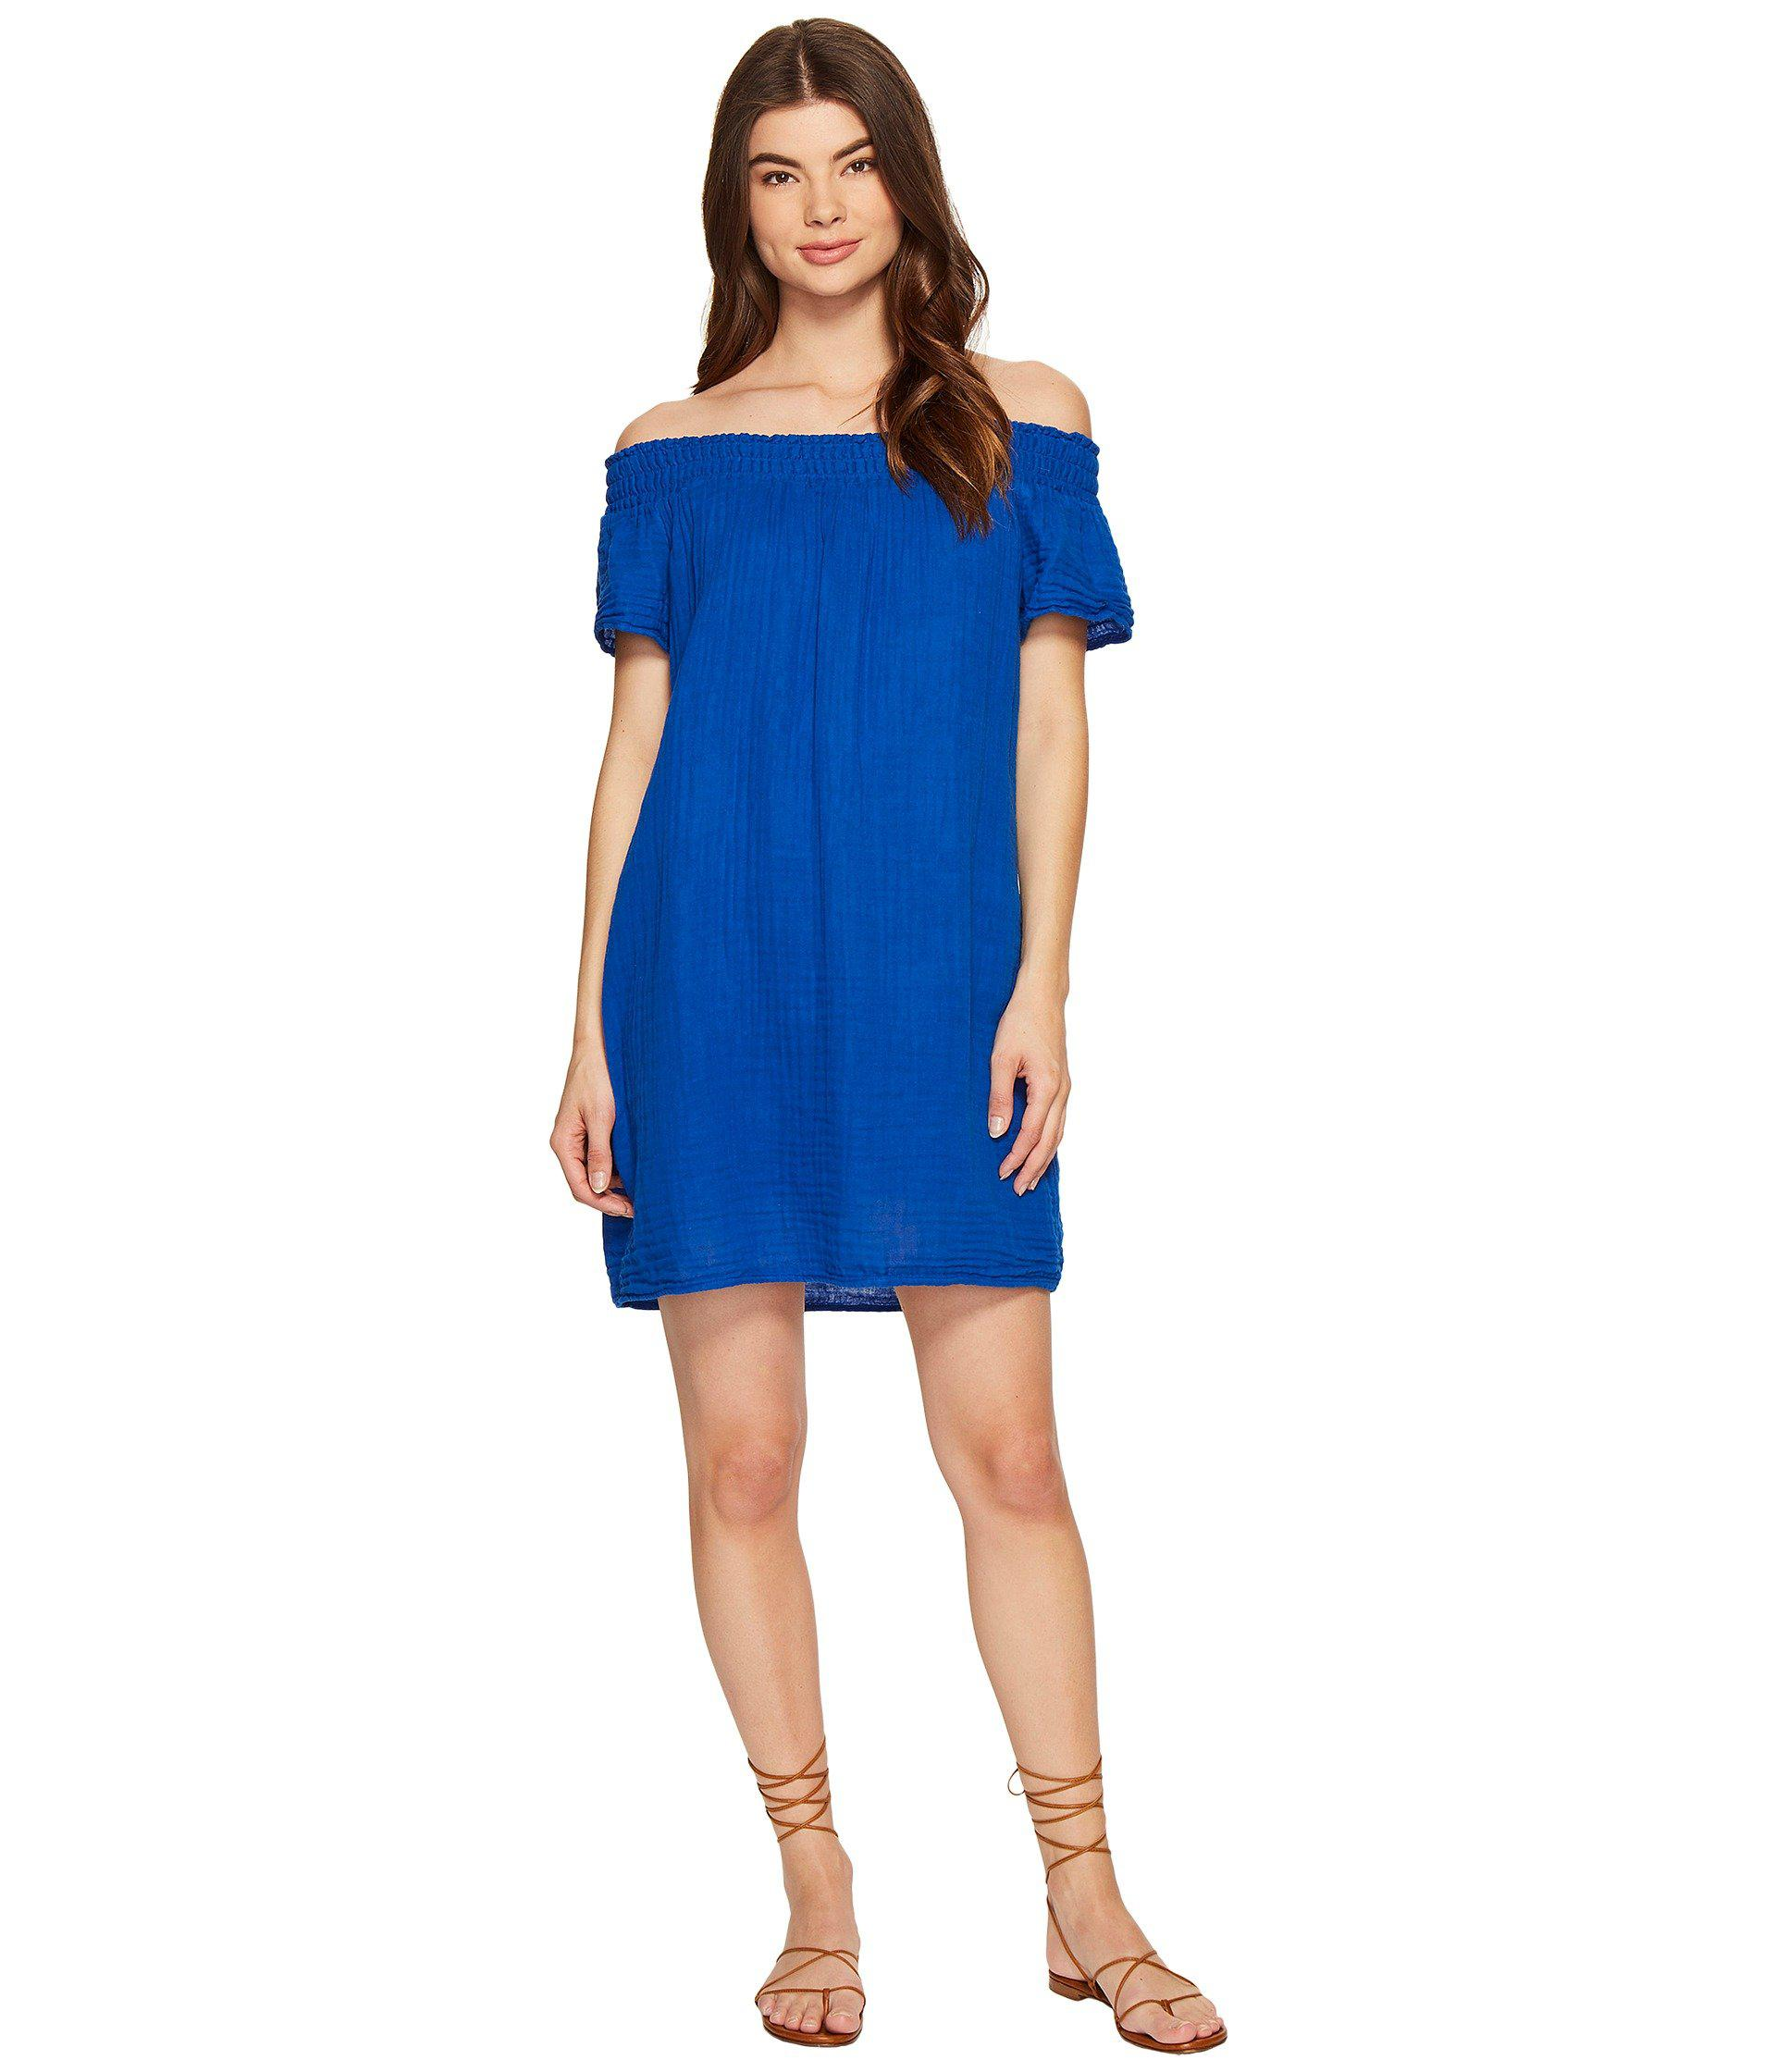 a43780bec40 Lyst - Michael Stars Double Gauze Smocked Off Shoulder Dress in Blue